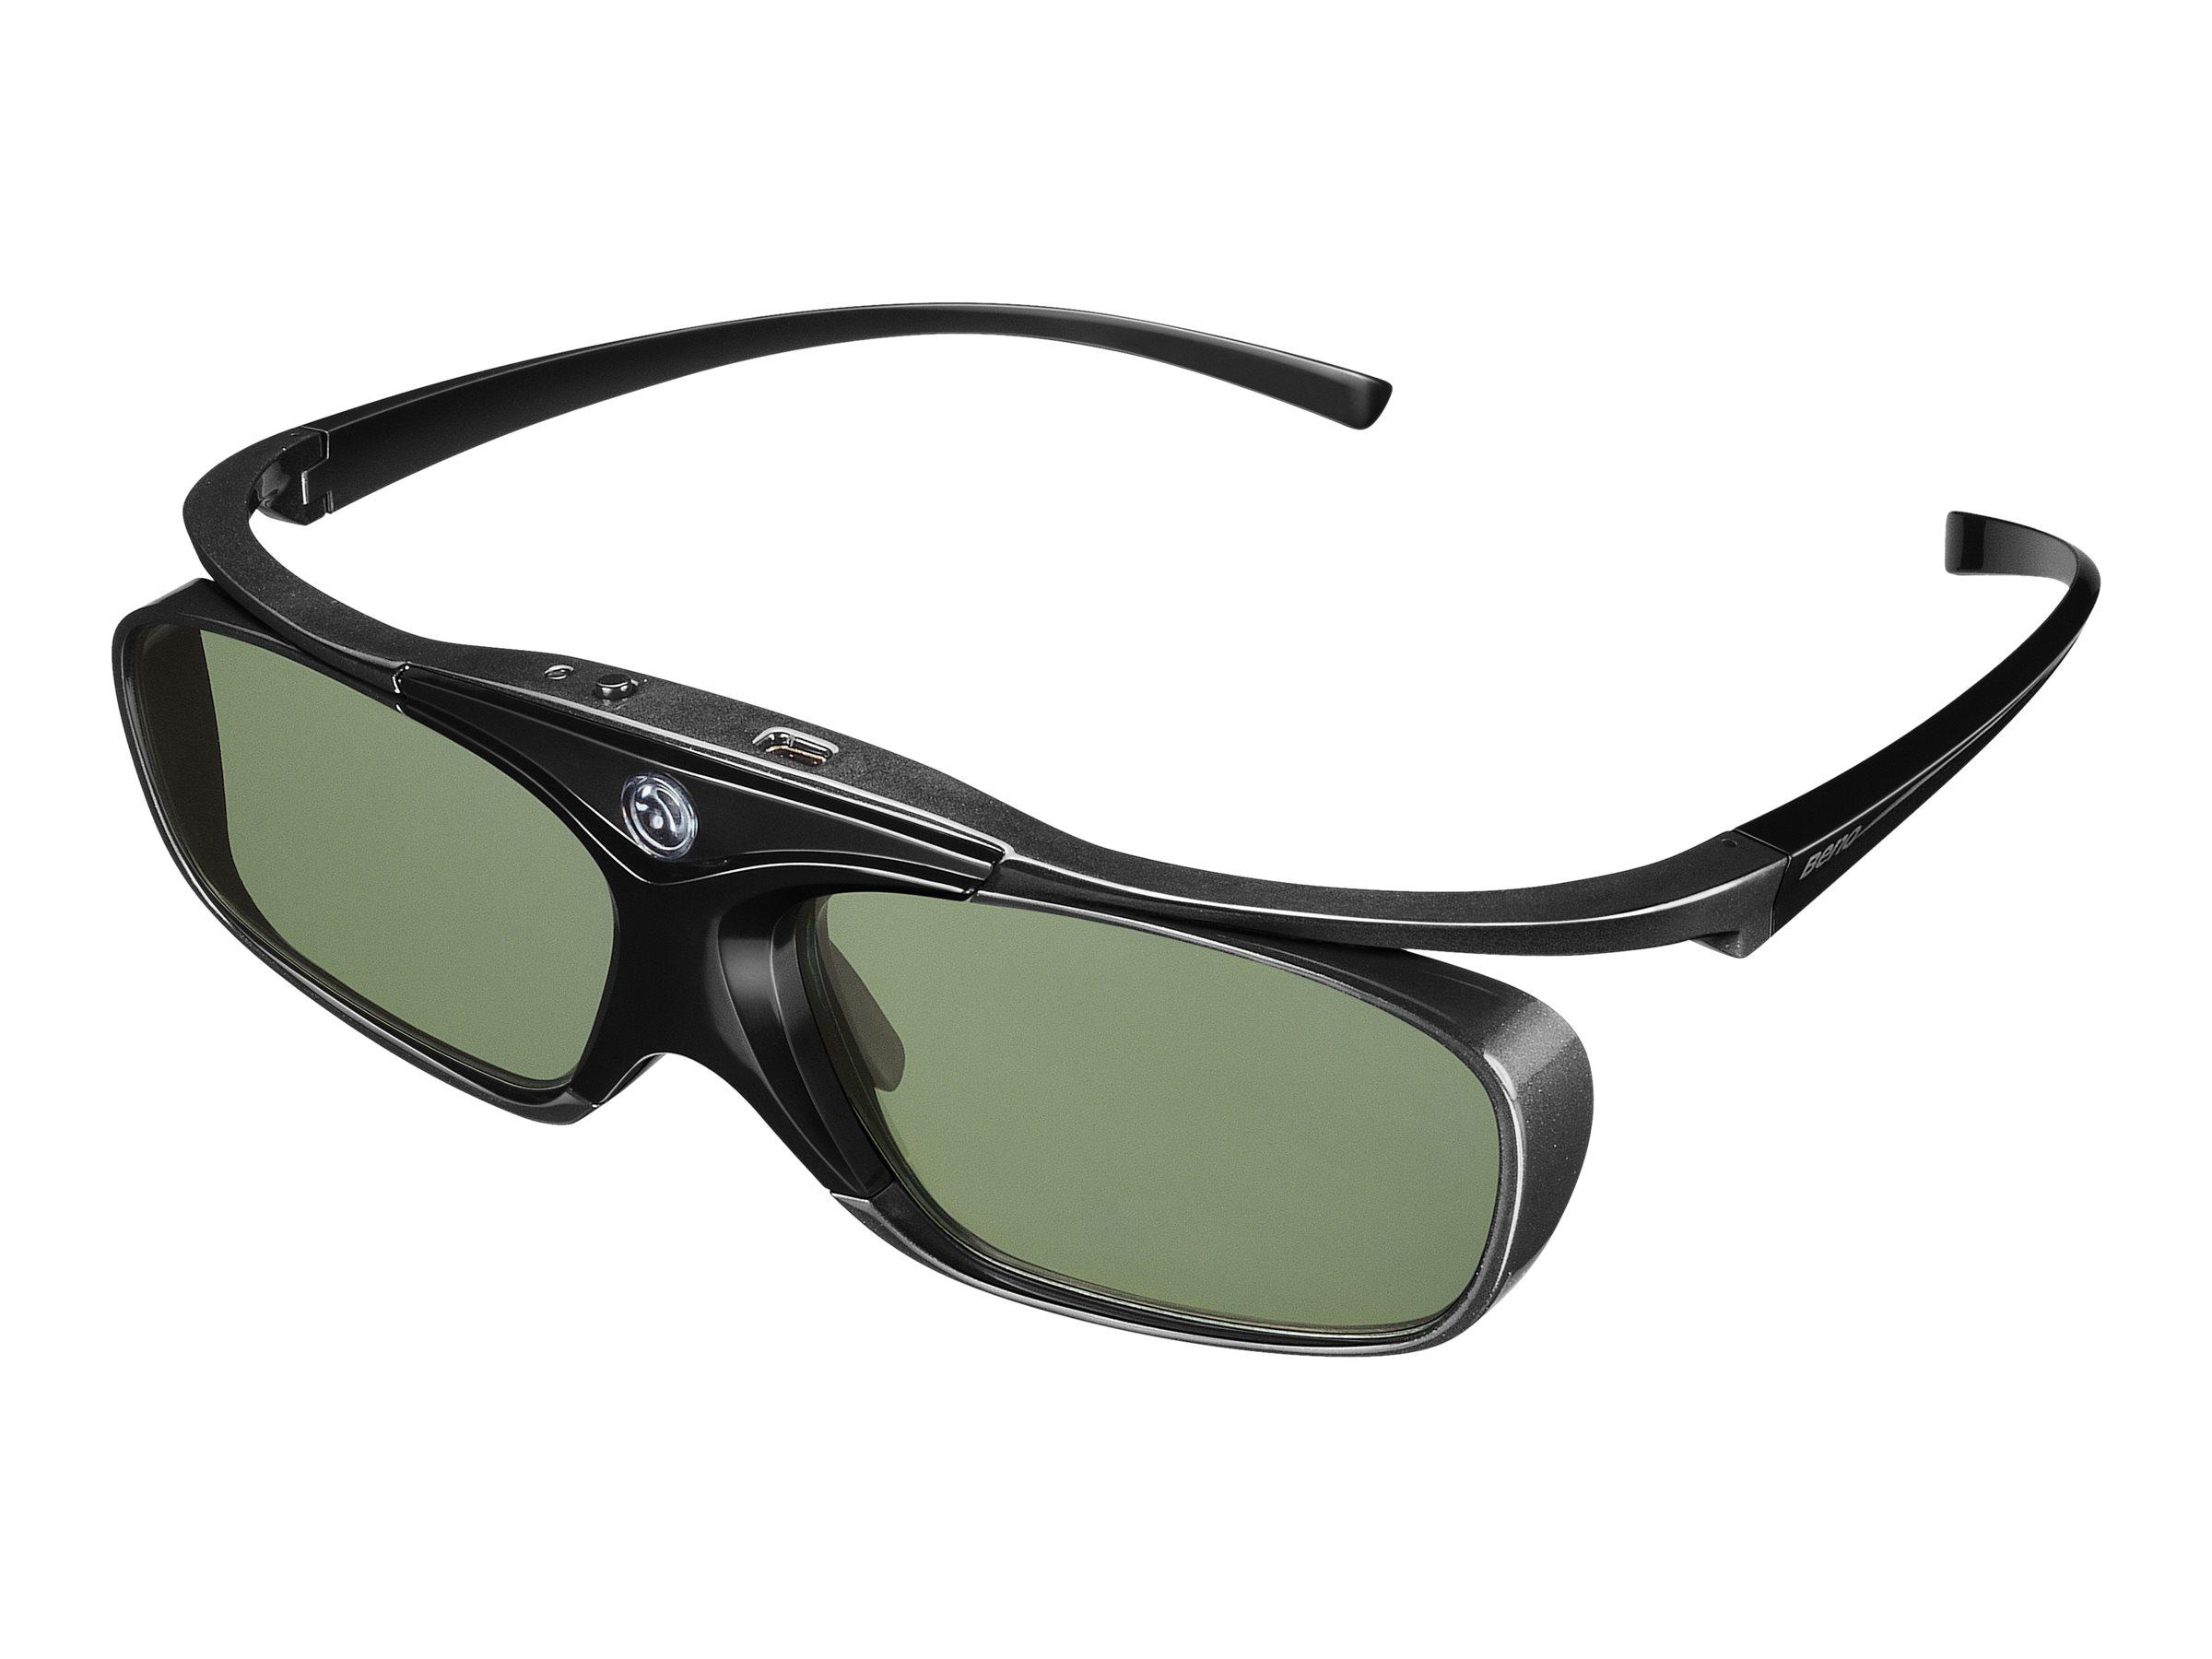 BenQ 3D Glasses DGD5 - 3D-Brille - Active Shutter - für BenQ MH534